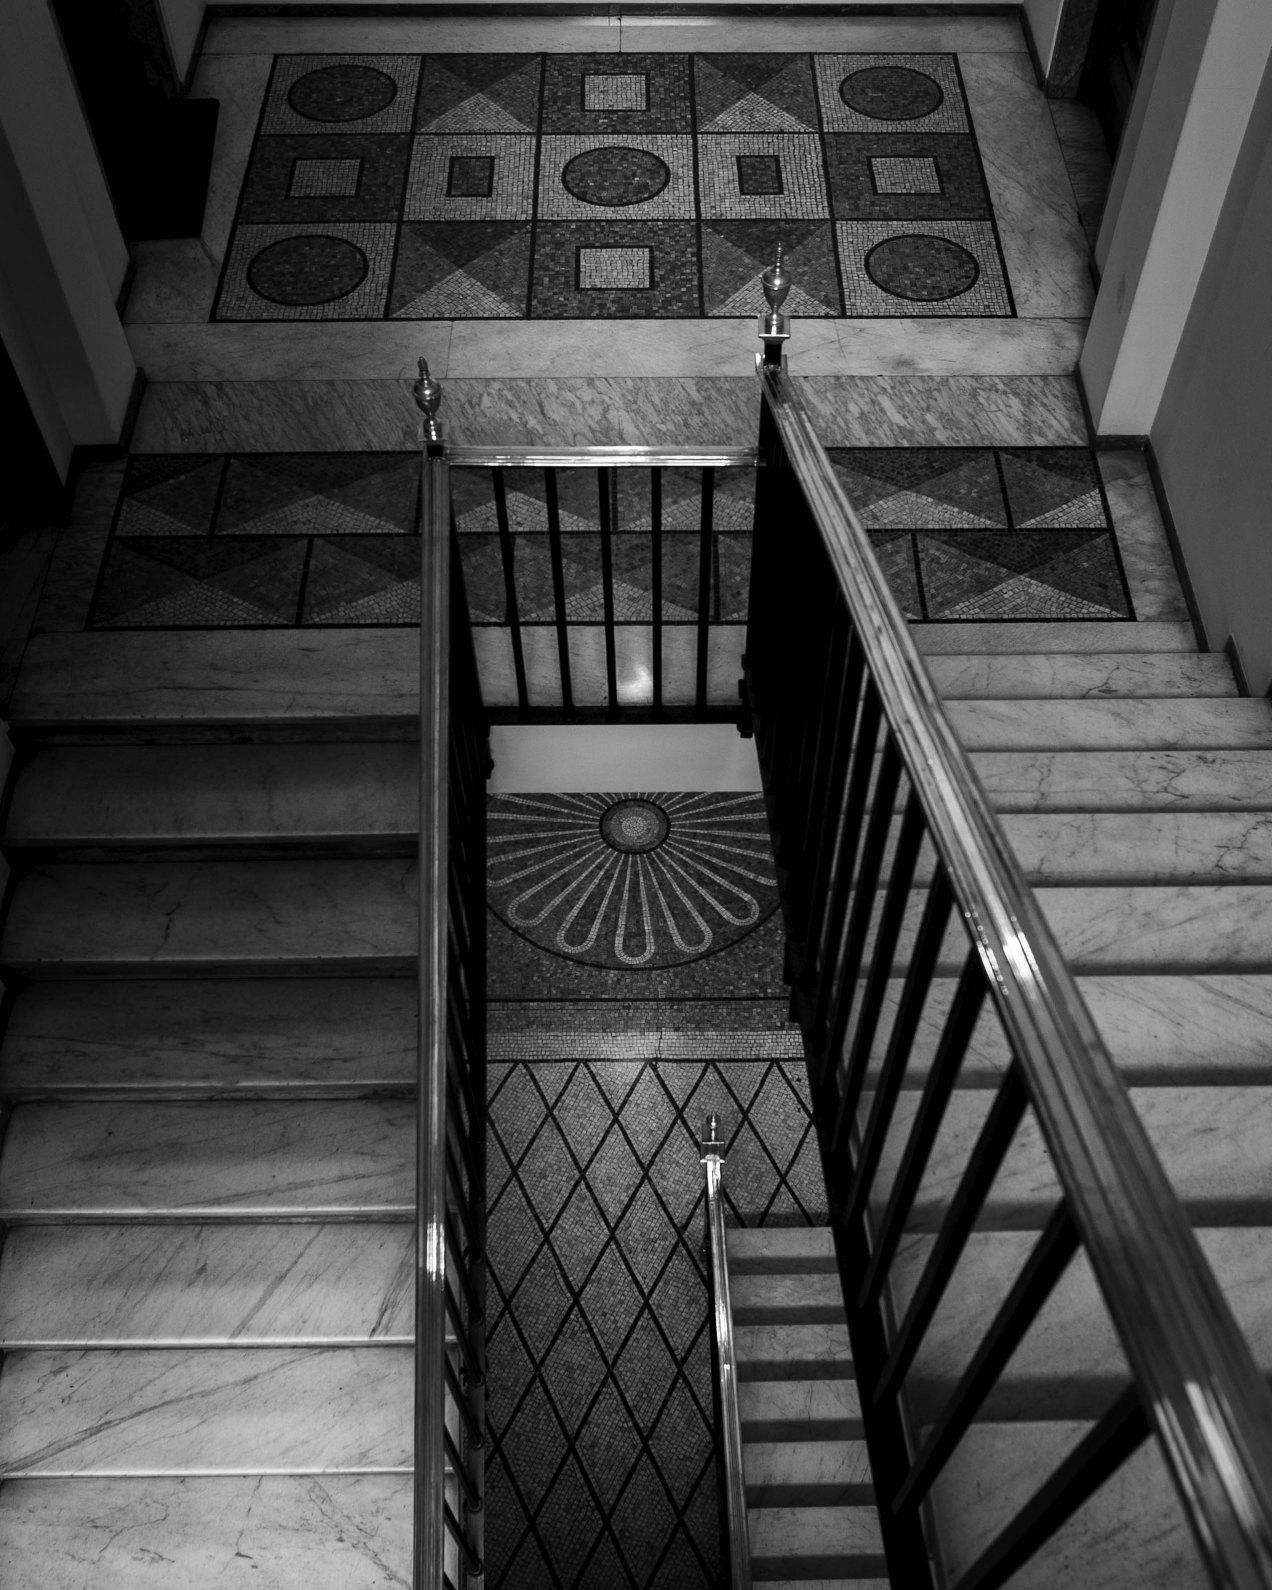 Motifs, cage d'escalier,Milan, gildalliere